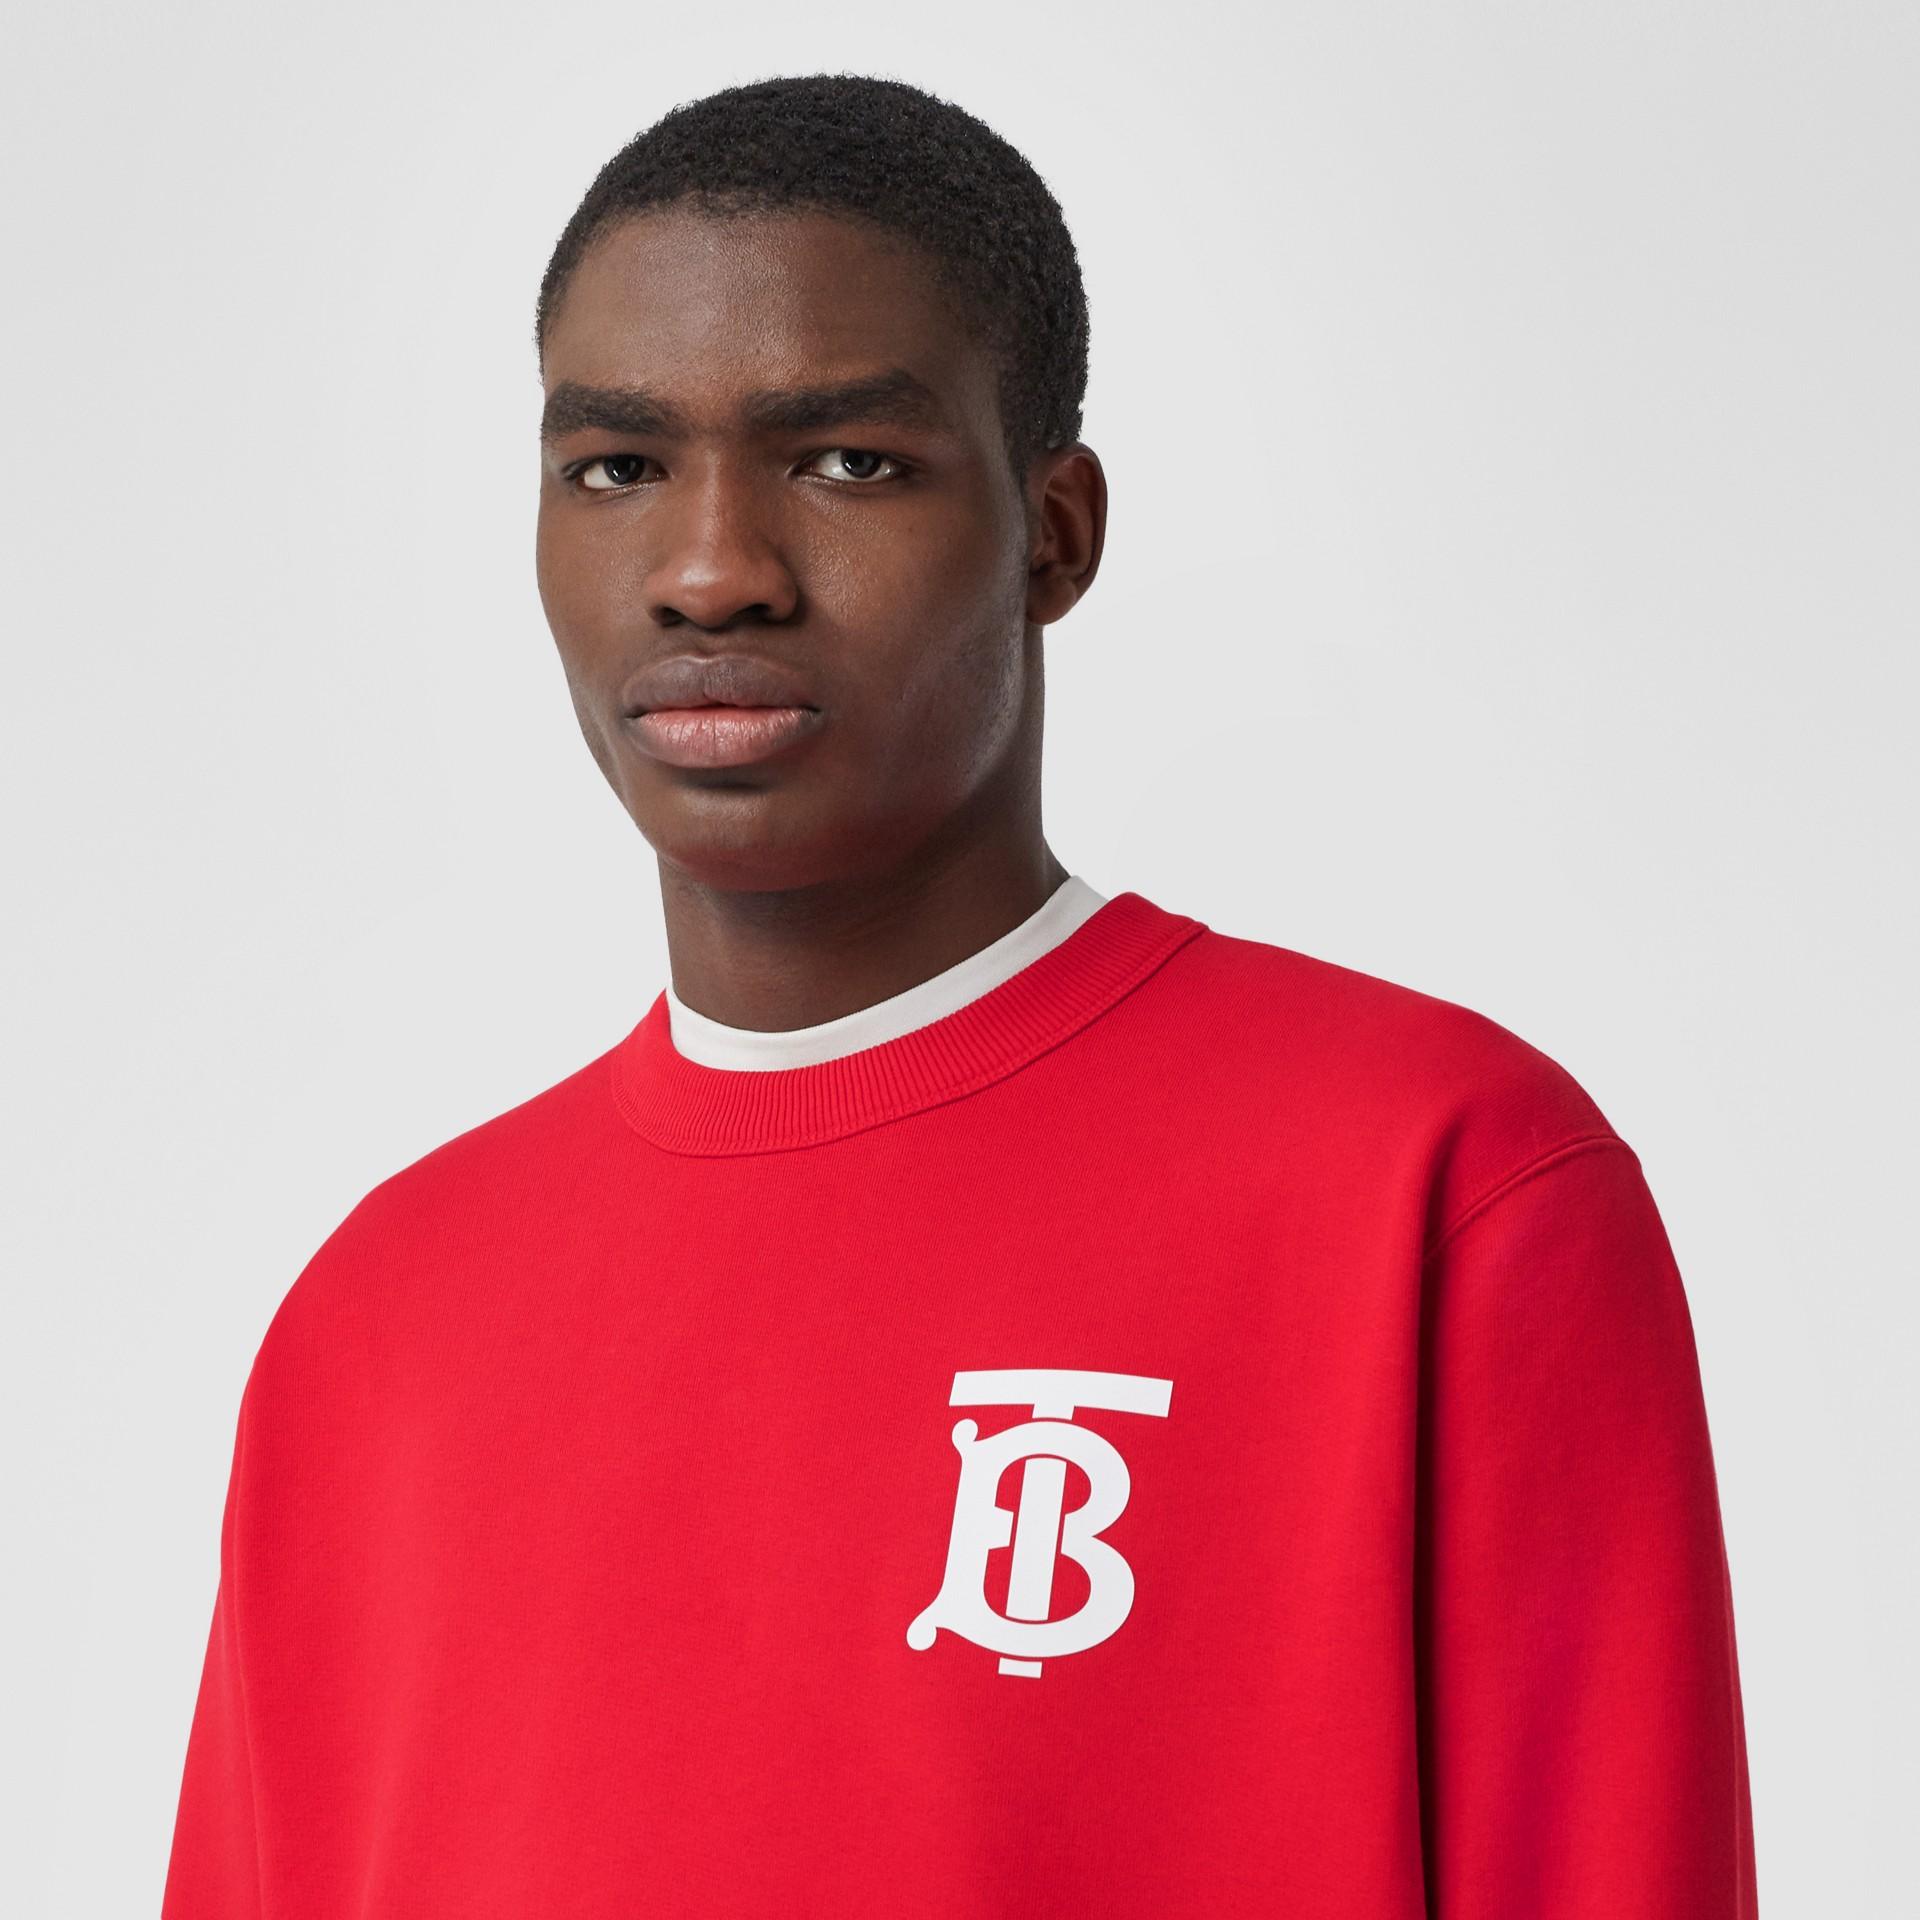 Monogram Motif Cotton Sweatshirt in Bright Red - Men | Burberry United Kingdom - gallery image 1